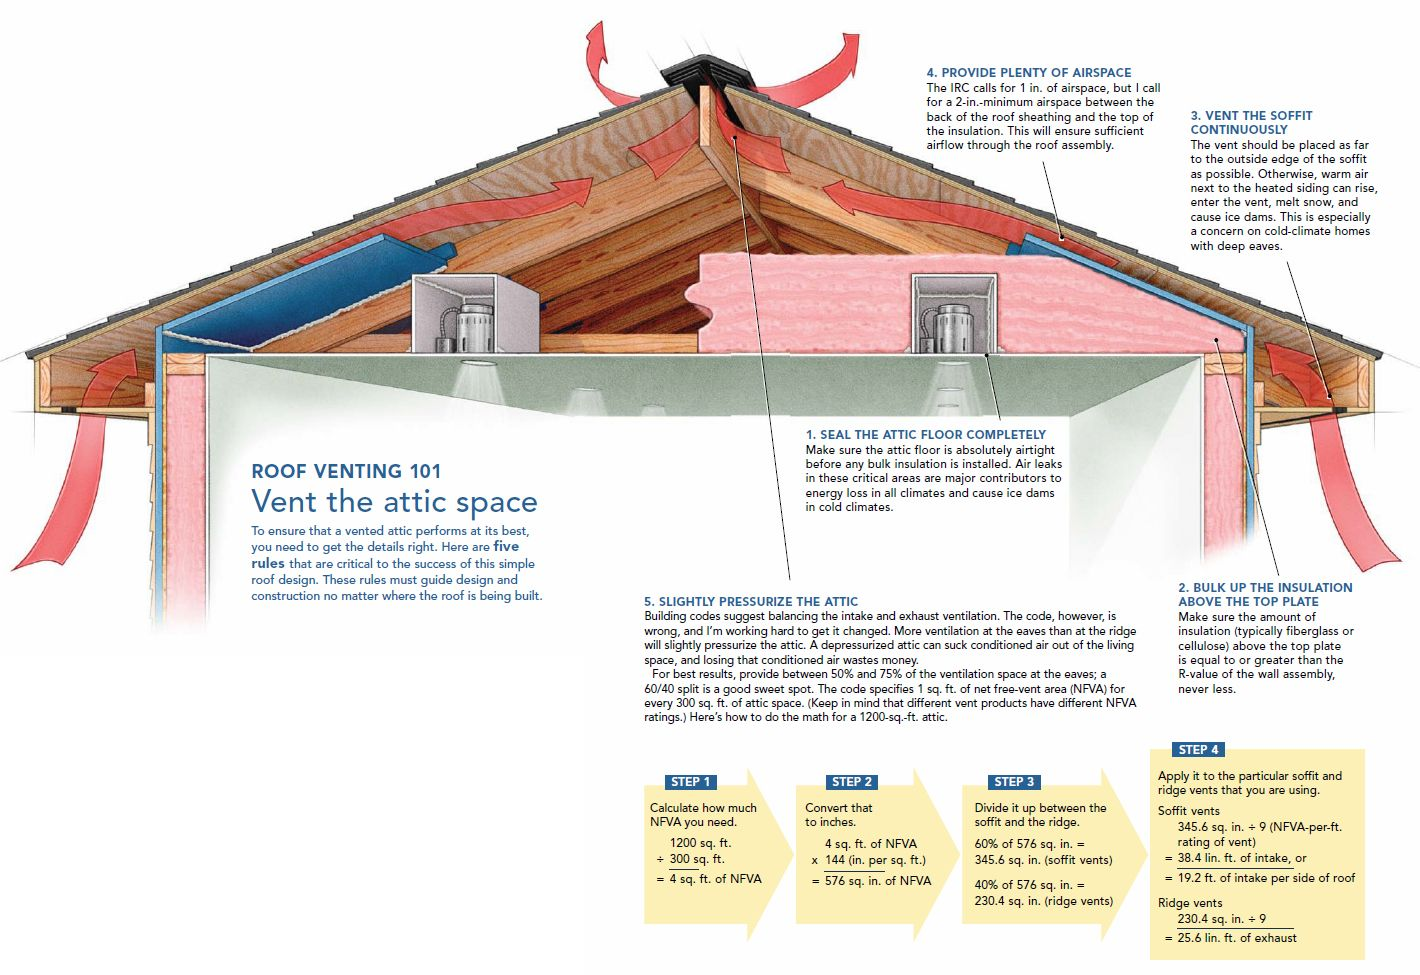 Residential Attic Ventilation Contractors Akron Cleveland Ohio Attic Ventilation Attic Renovation Attic Remodel